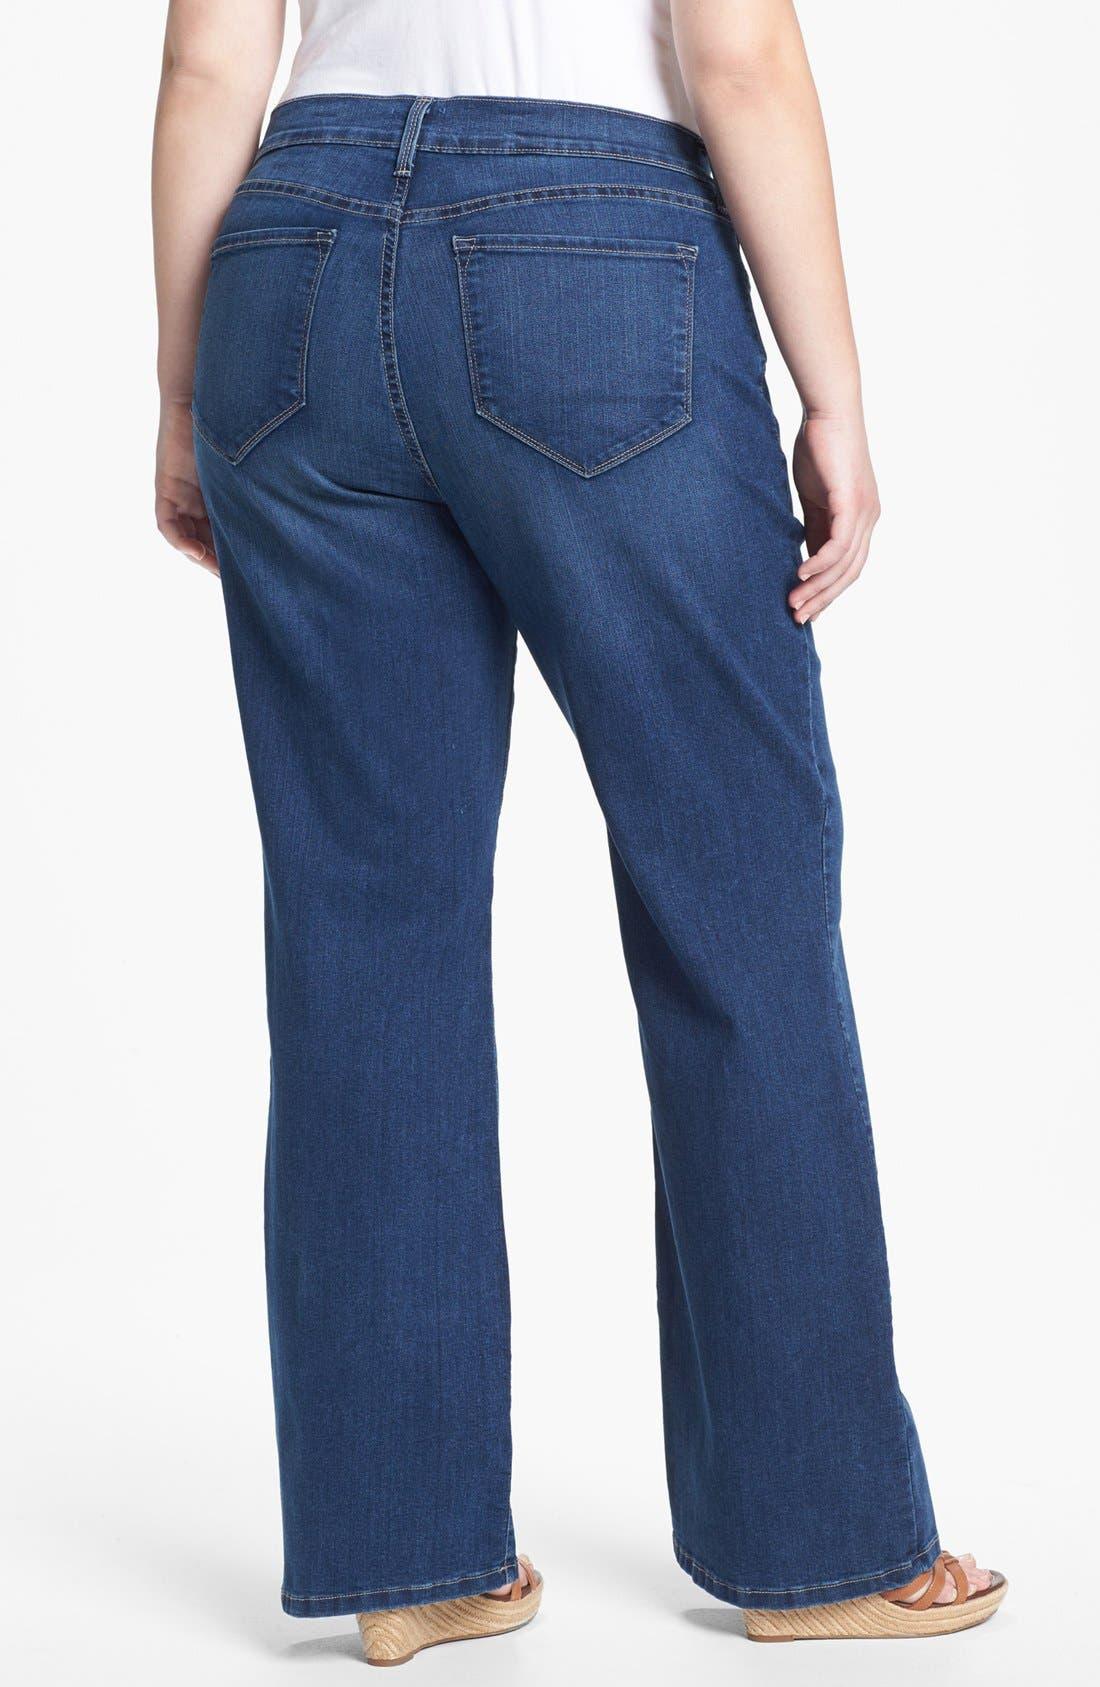 Alternate Image 2  - NYDJ 'Sarah' Bootcut Jeans (Plus Size)